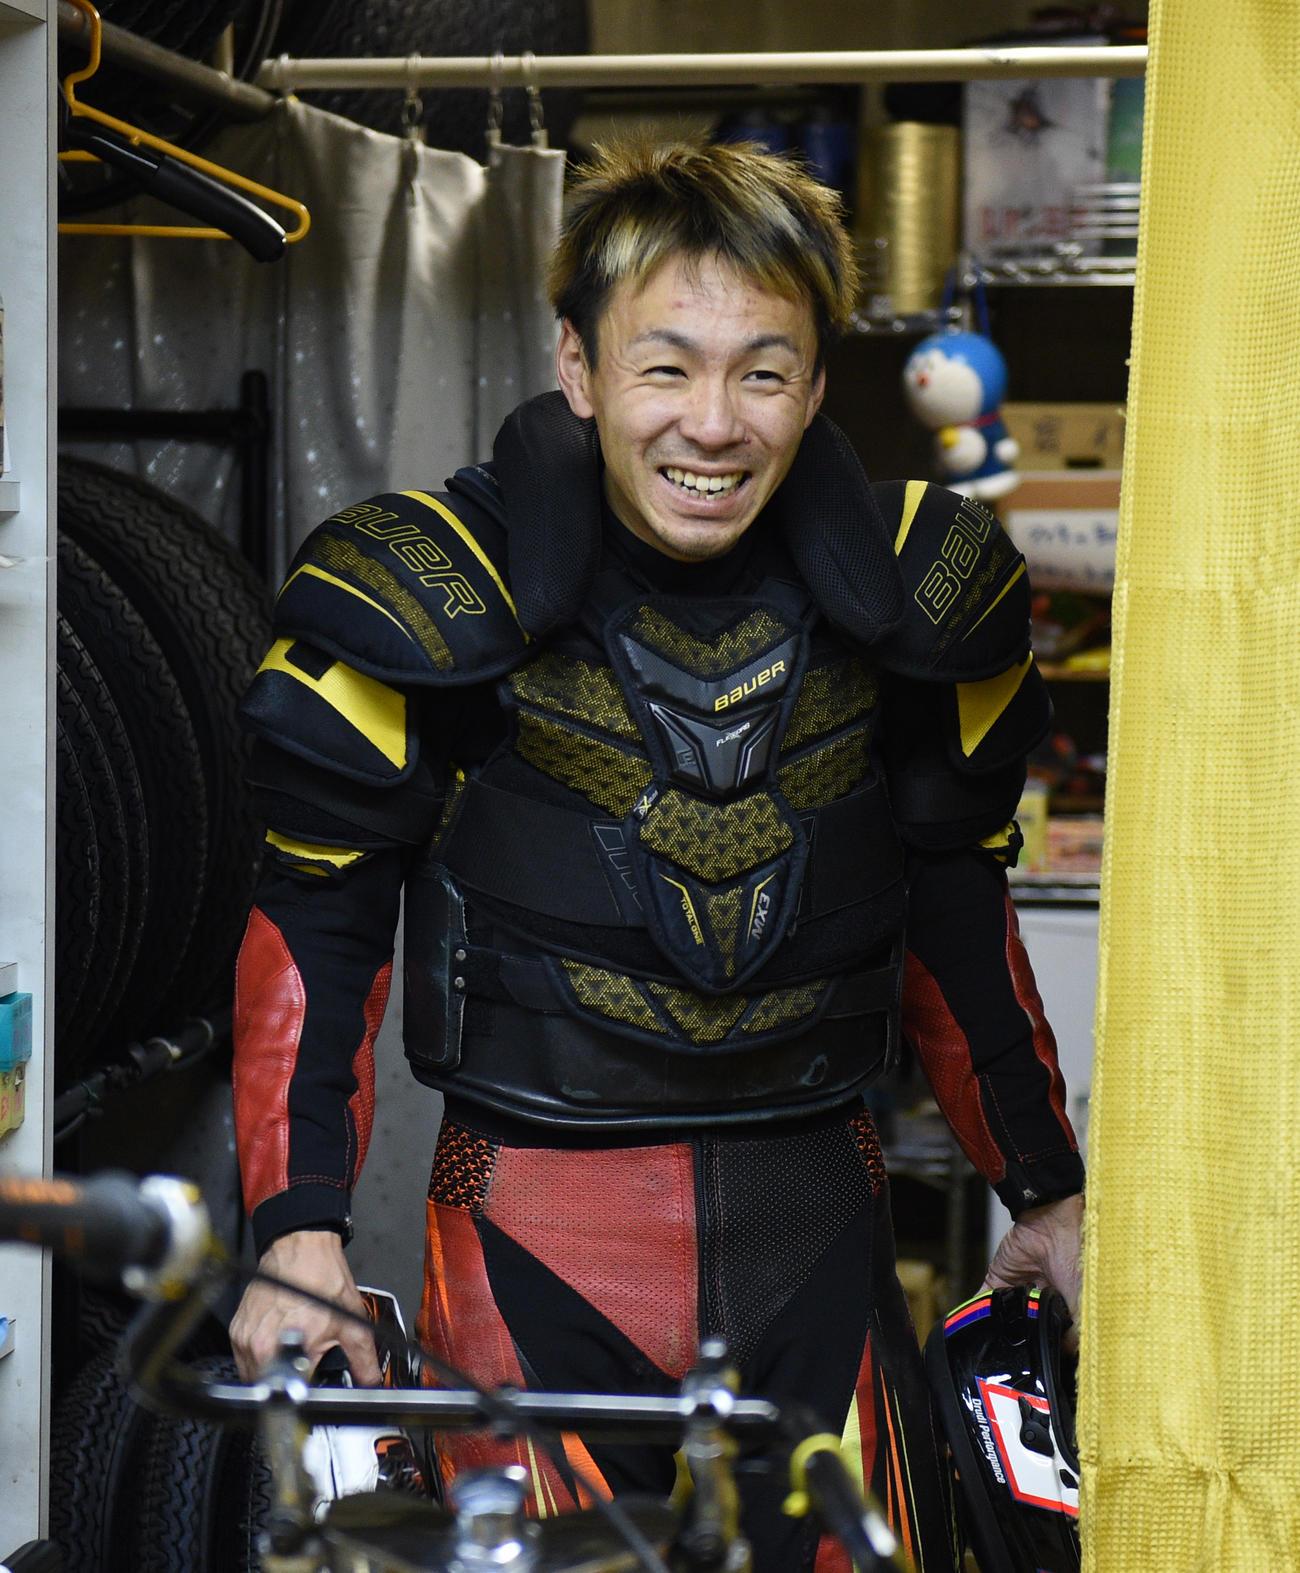 SG日本選手権初日、1次予選1Rで1着岩田裕臣を笑顔を見せる(撮影・柴田隆二)